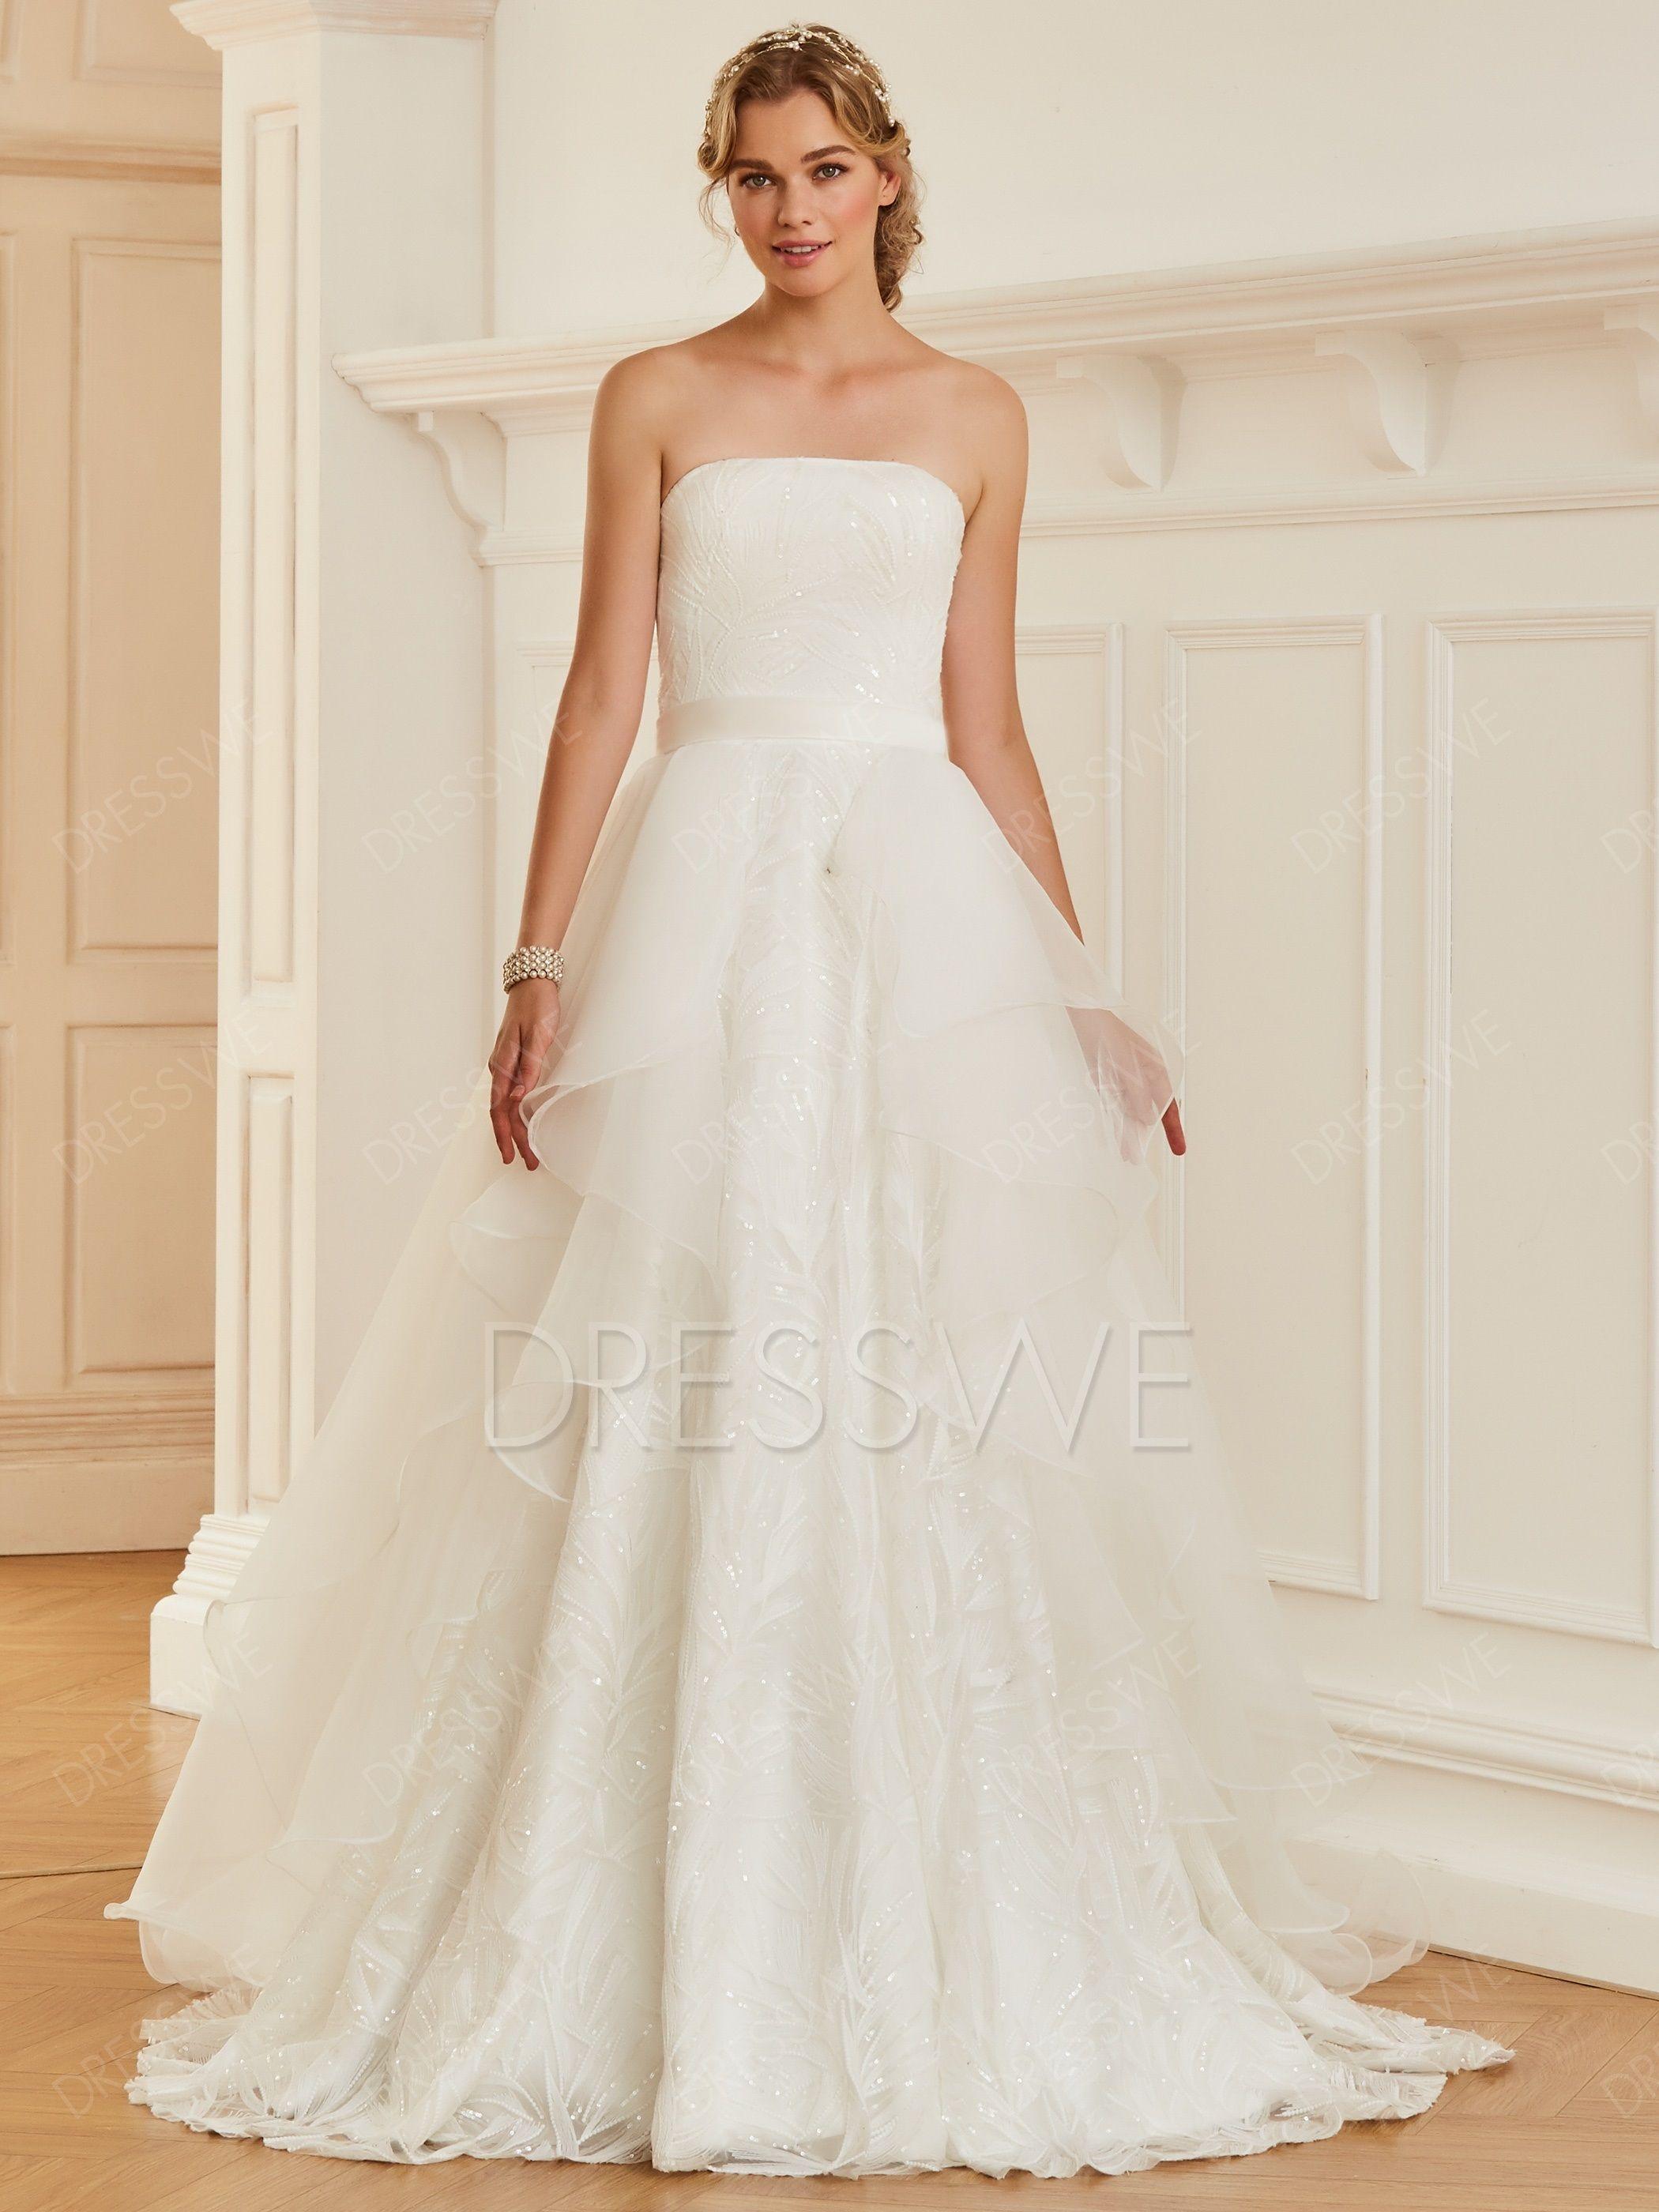 Strapless Sequins Court Train Floor Length Wedding Dress Material Organza